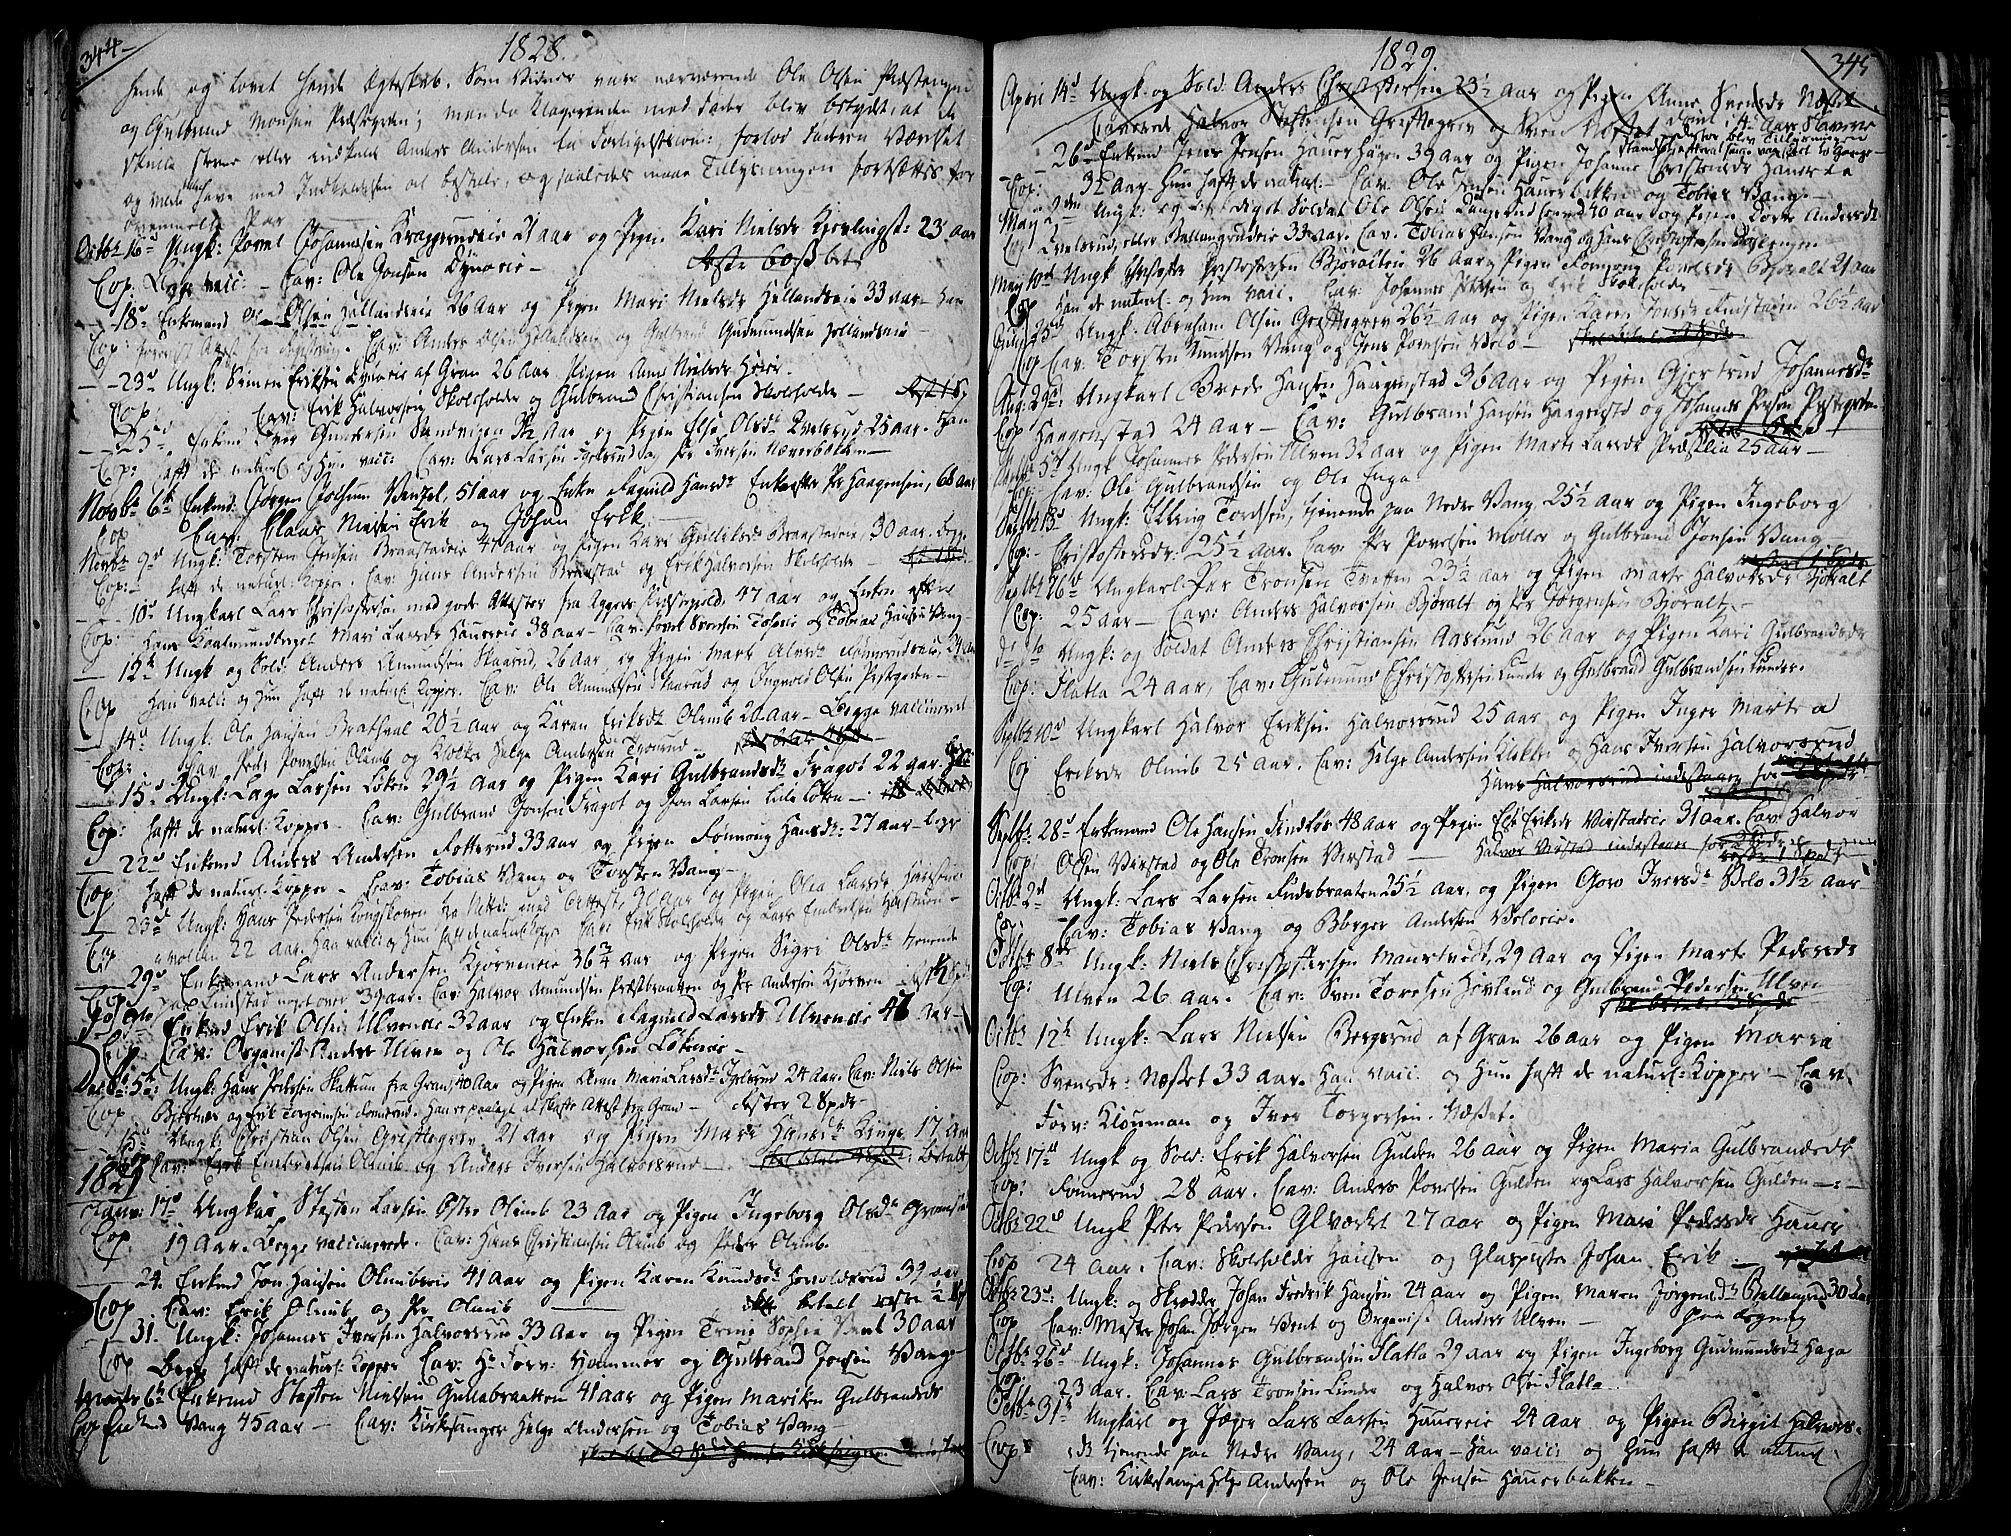 SAH, Jevnaker prestekontor, Ministerialbok nr. 4, 1800-1861, s. 344-345